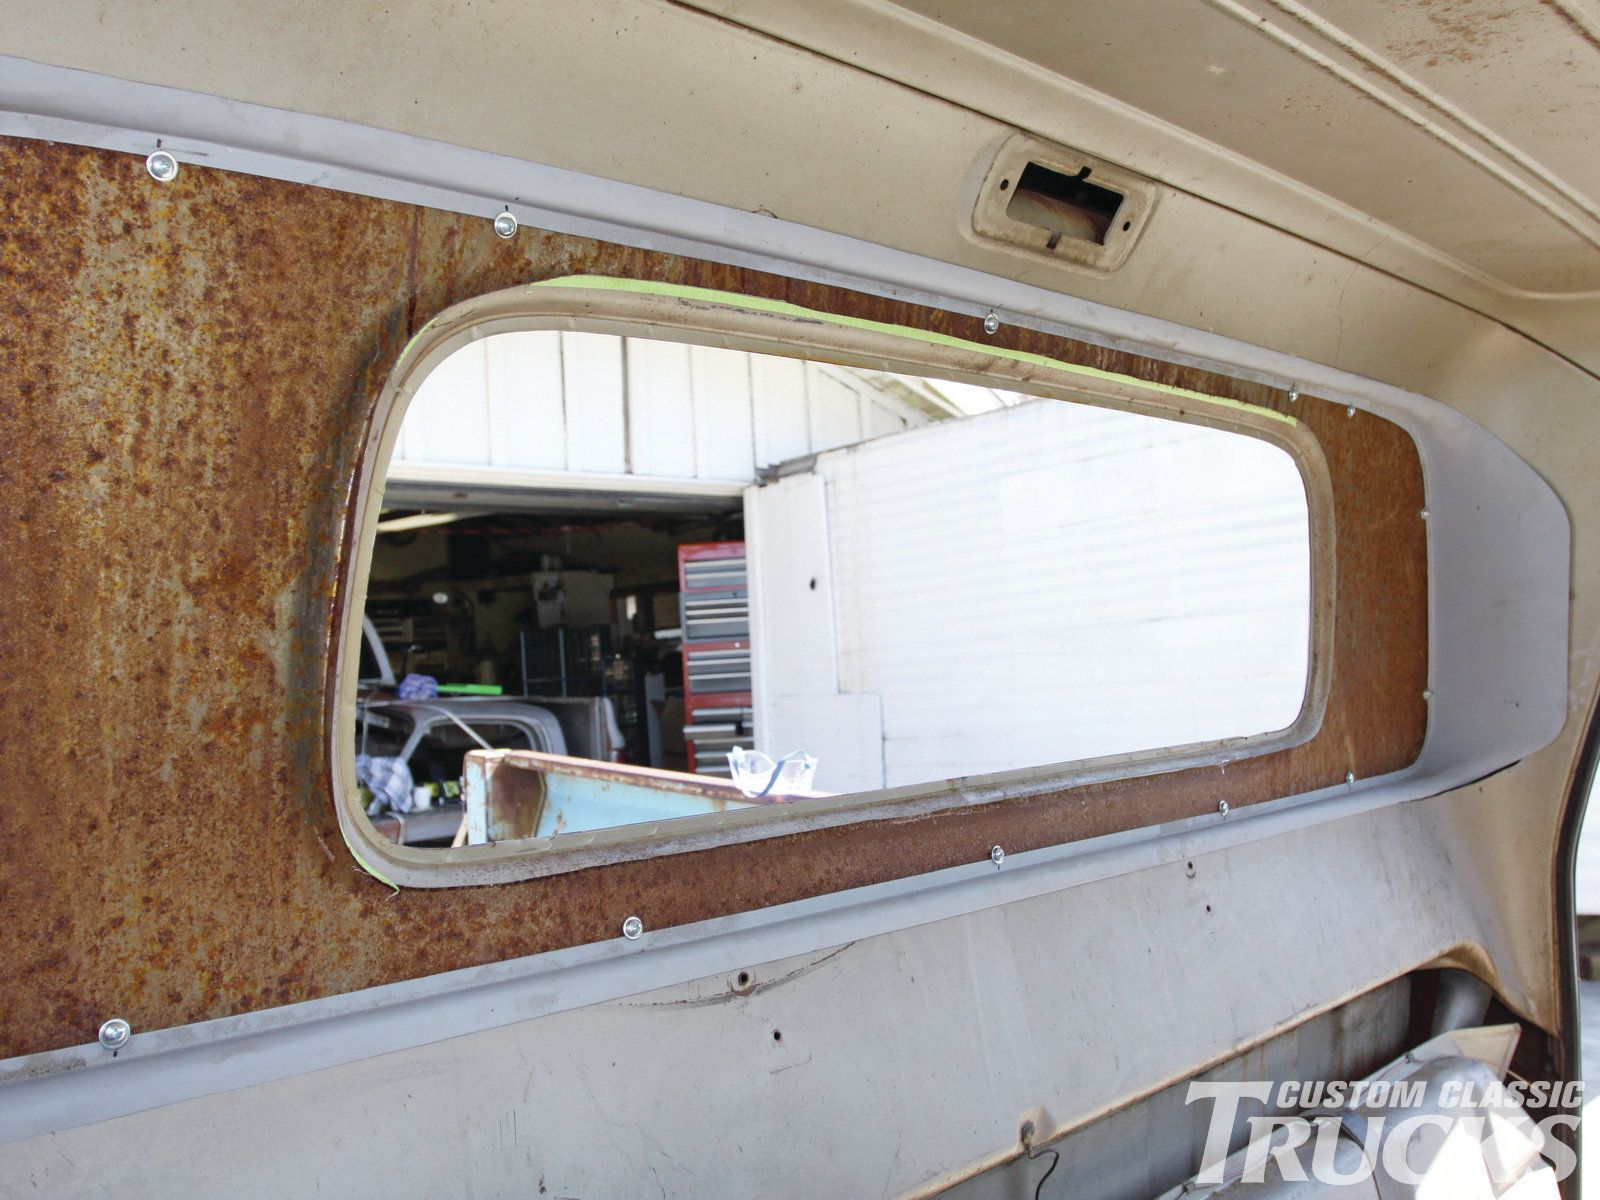 1960 To 1966 Chevrolet C10 Small To Big Window Conversion Hot Classic Trucks Magazine Big Windows Classic Trucks